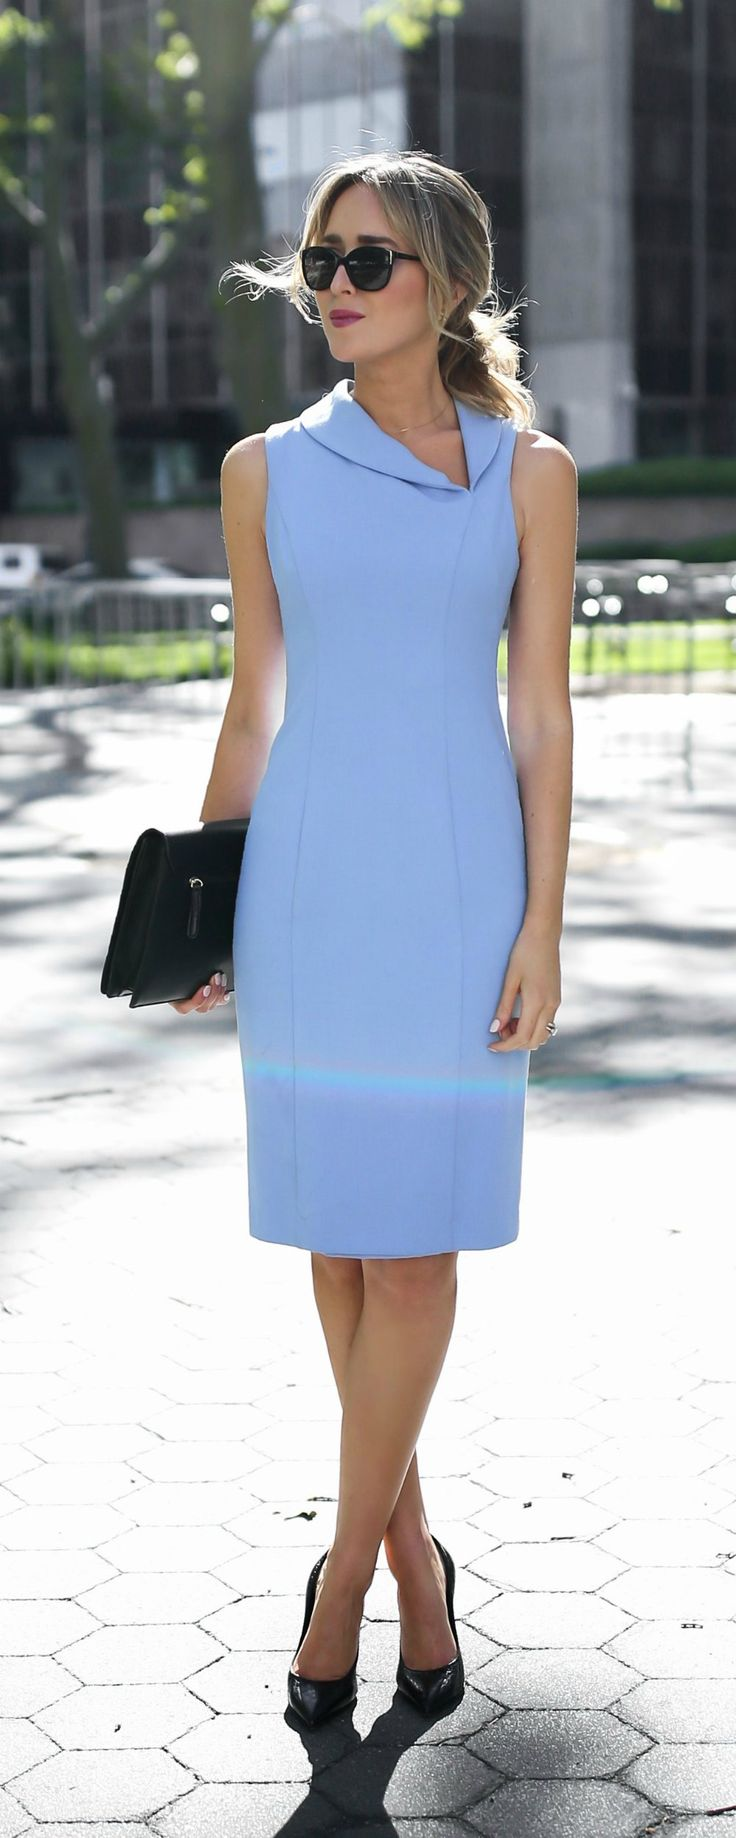 Best 25+ Classic dresses ideas on Pinterest | Dresses for ...